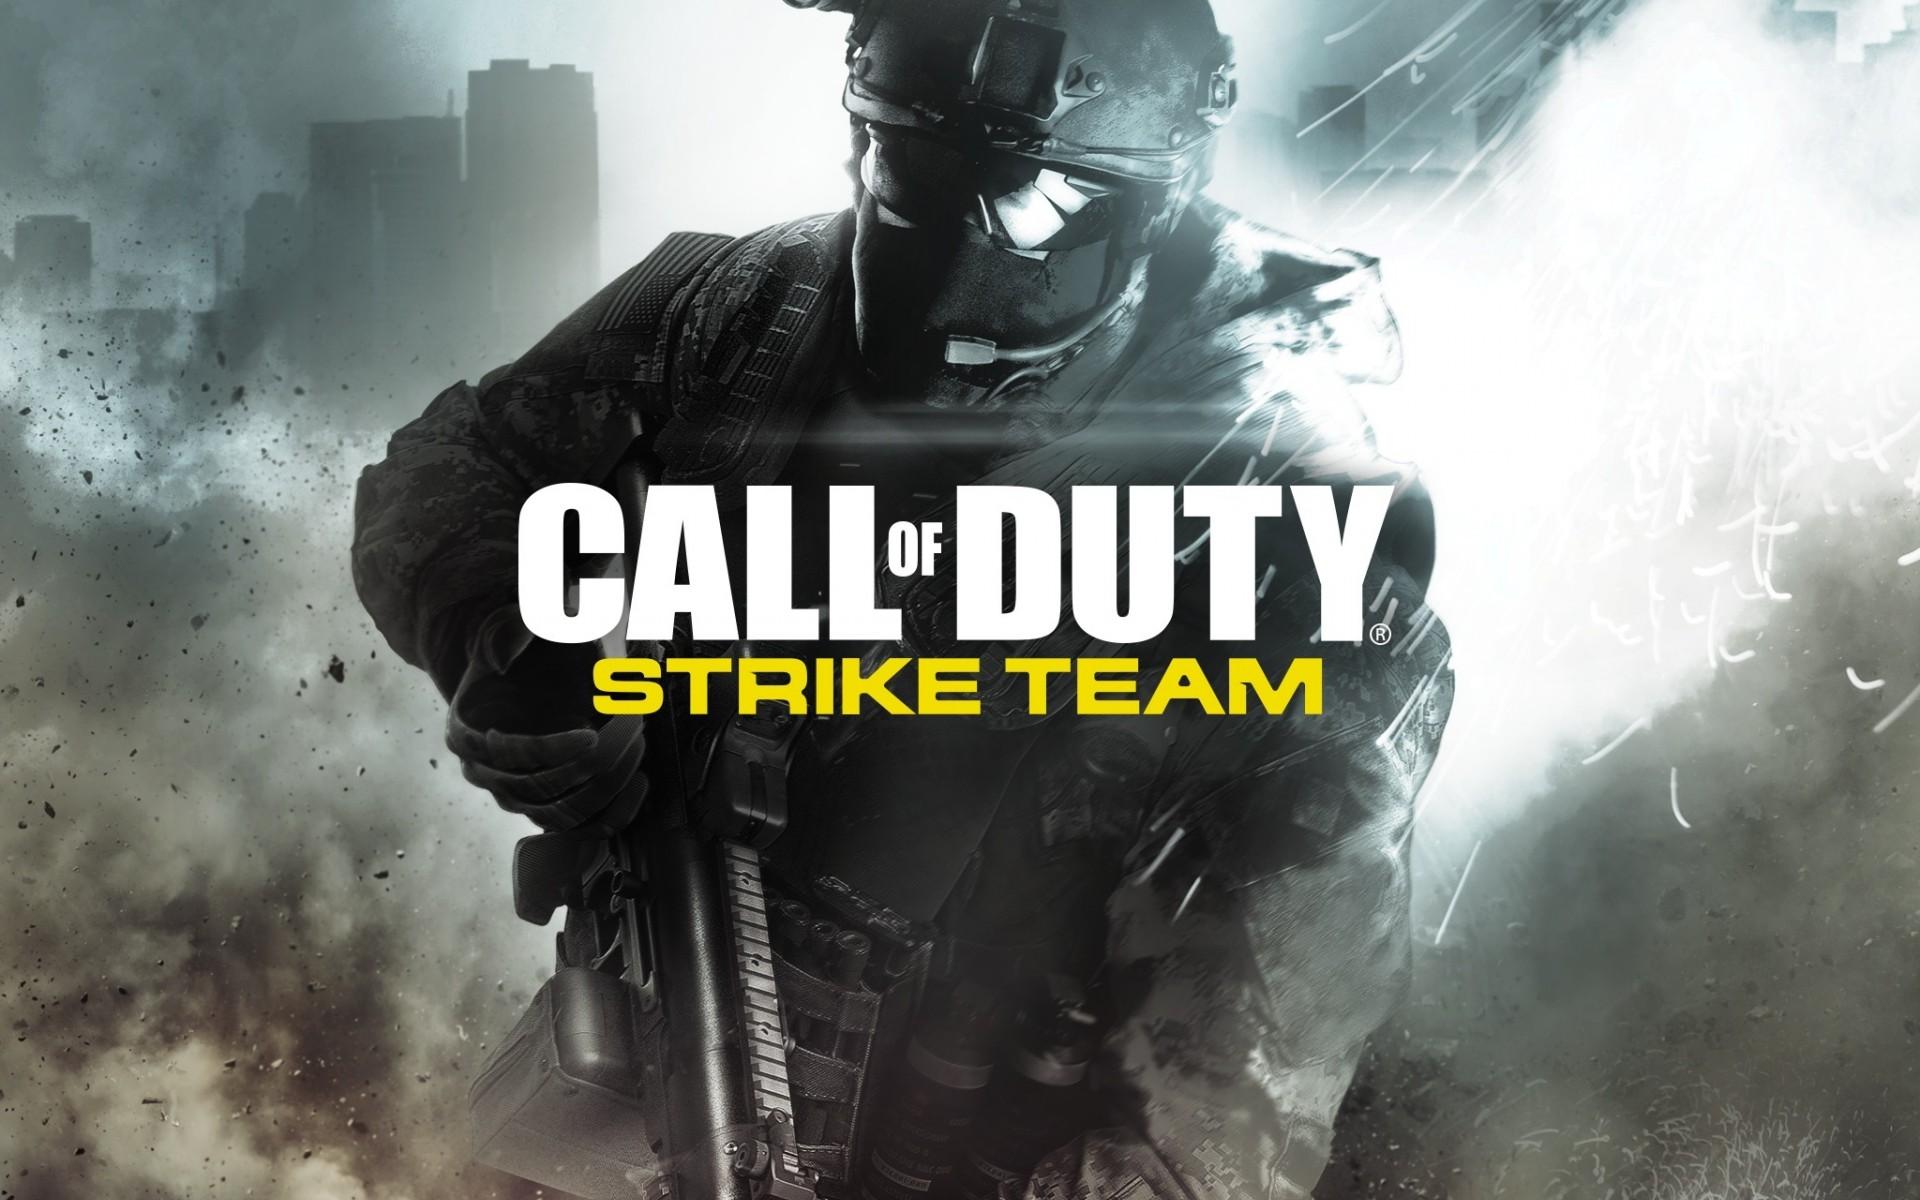 HD Wallpapers Call of Duty Strike Team